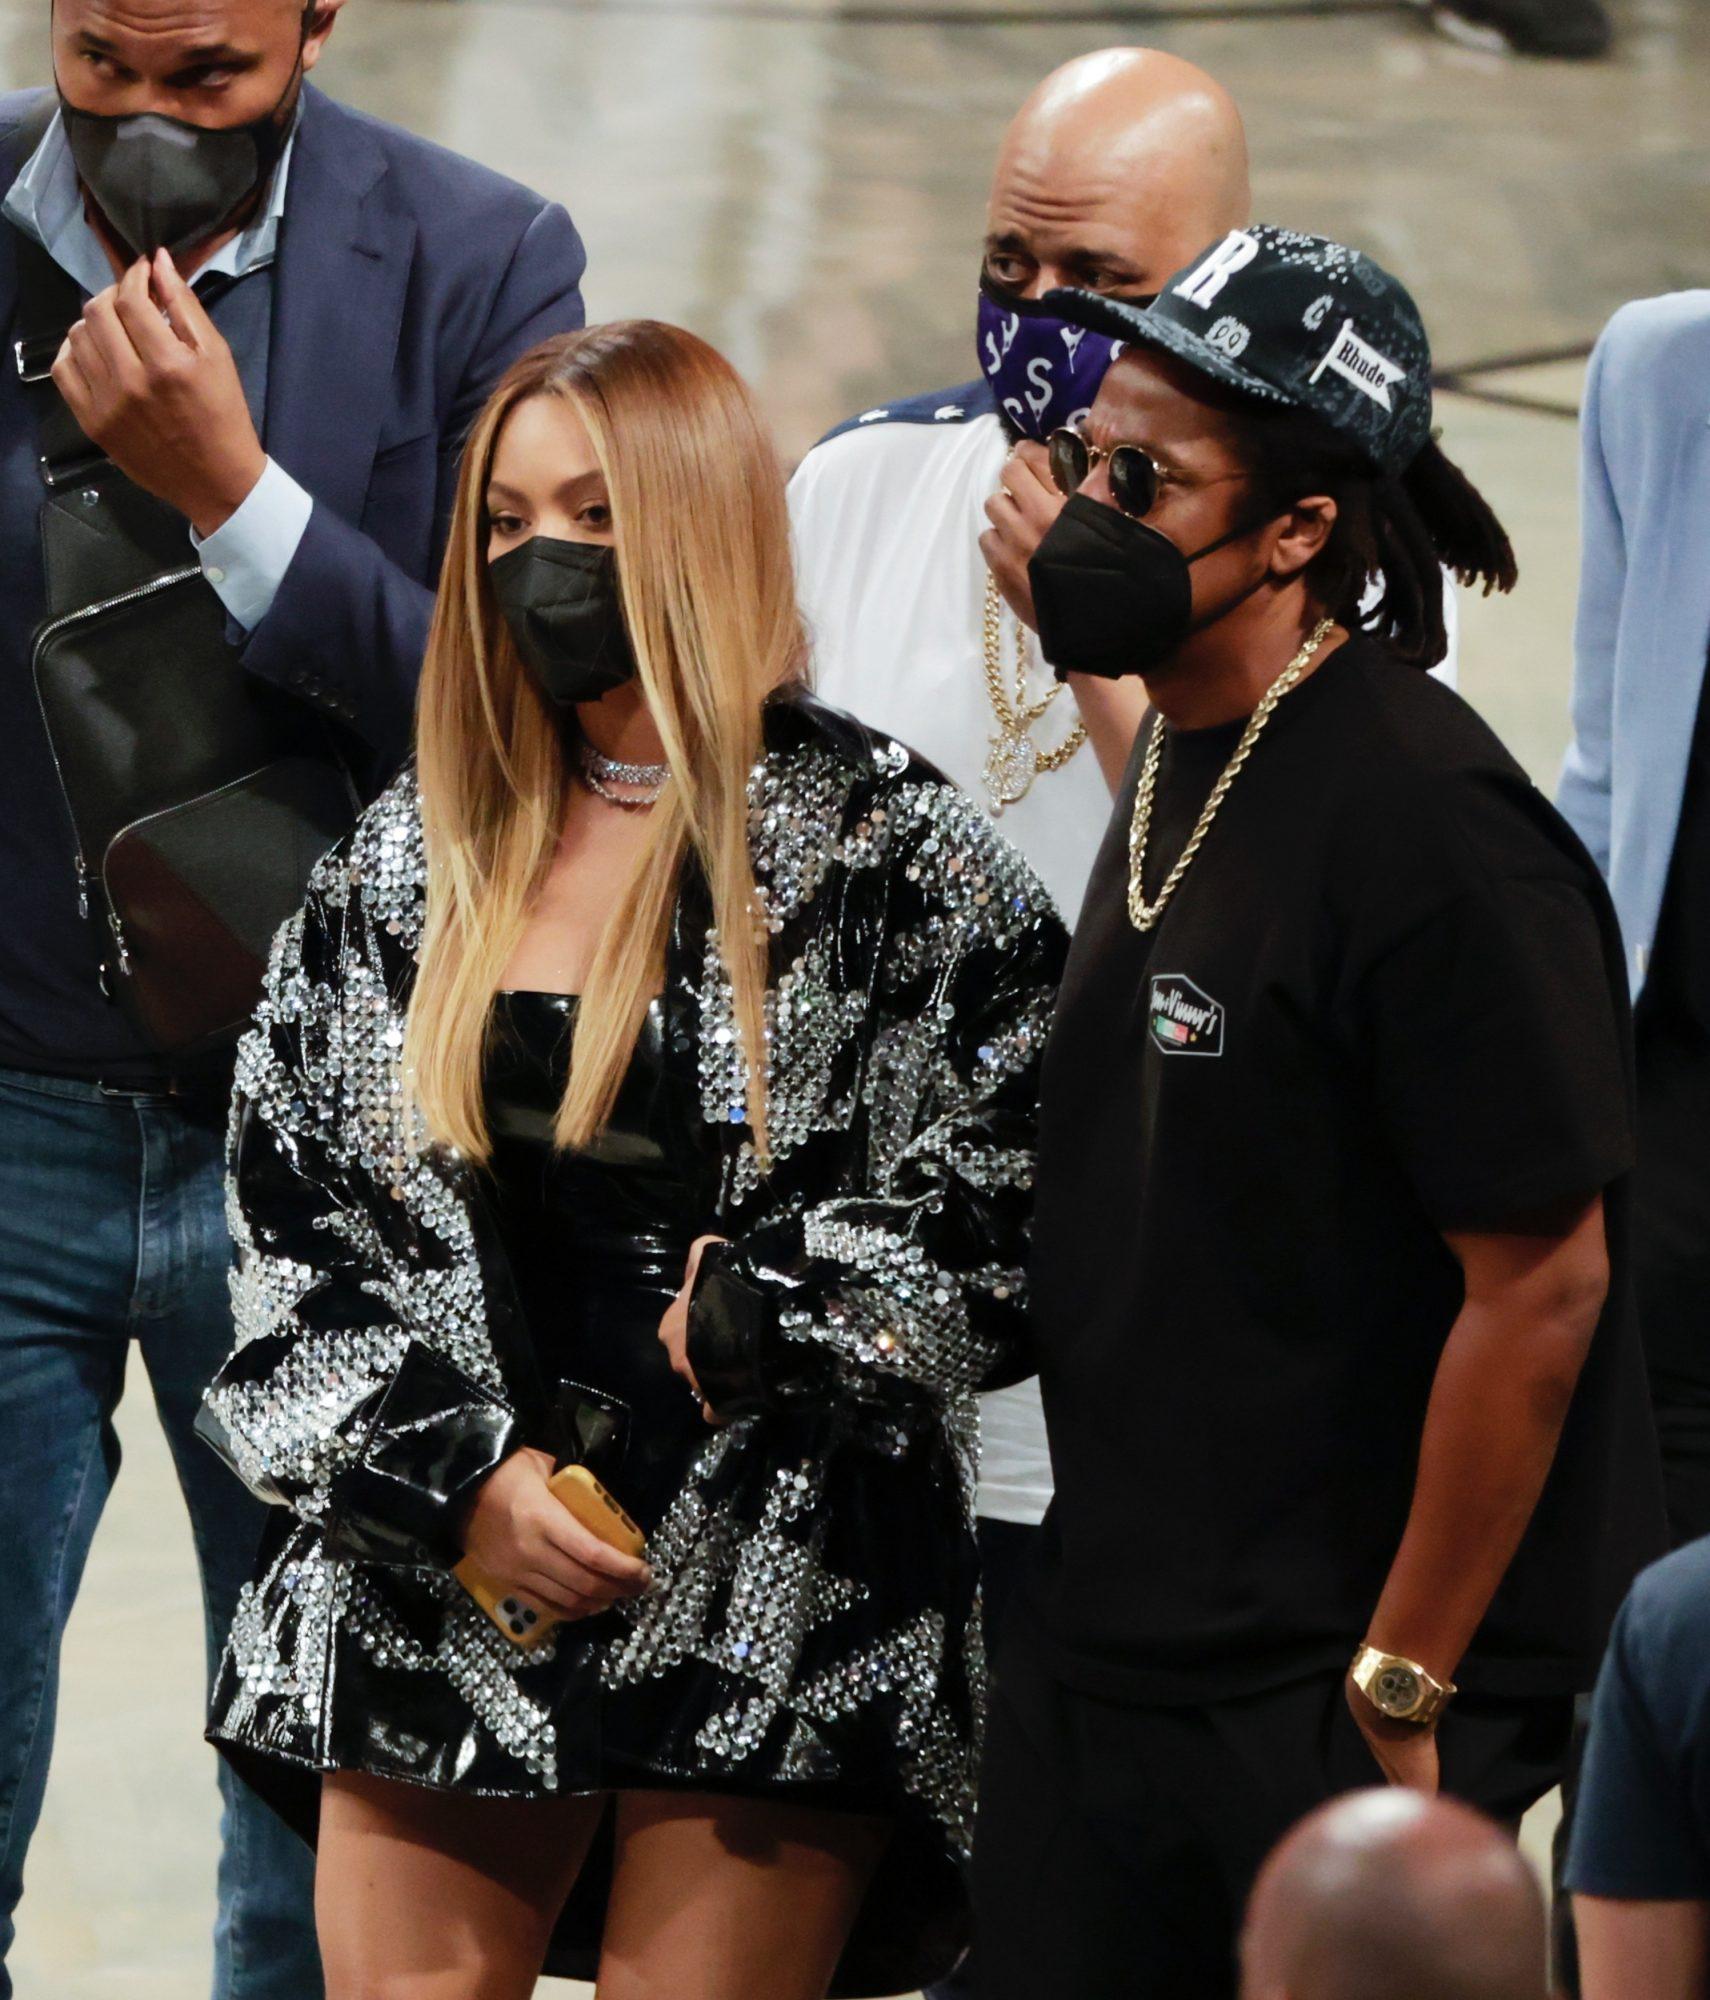 Beyonce & Jay-Z Make an Appearance at the Milwaukee Bucks vs Brooklyn Nets Game